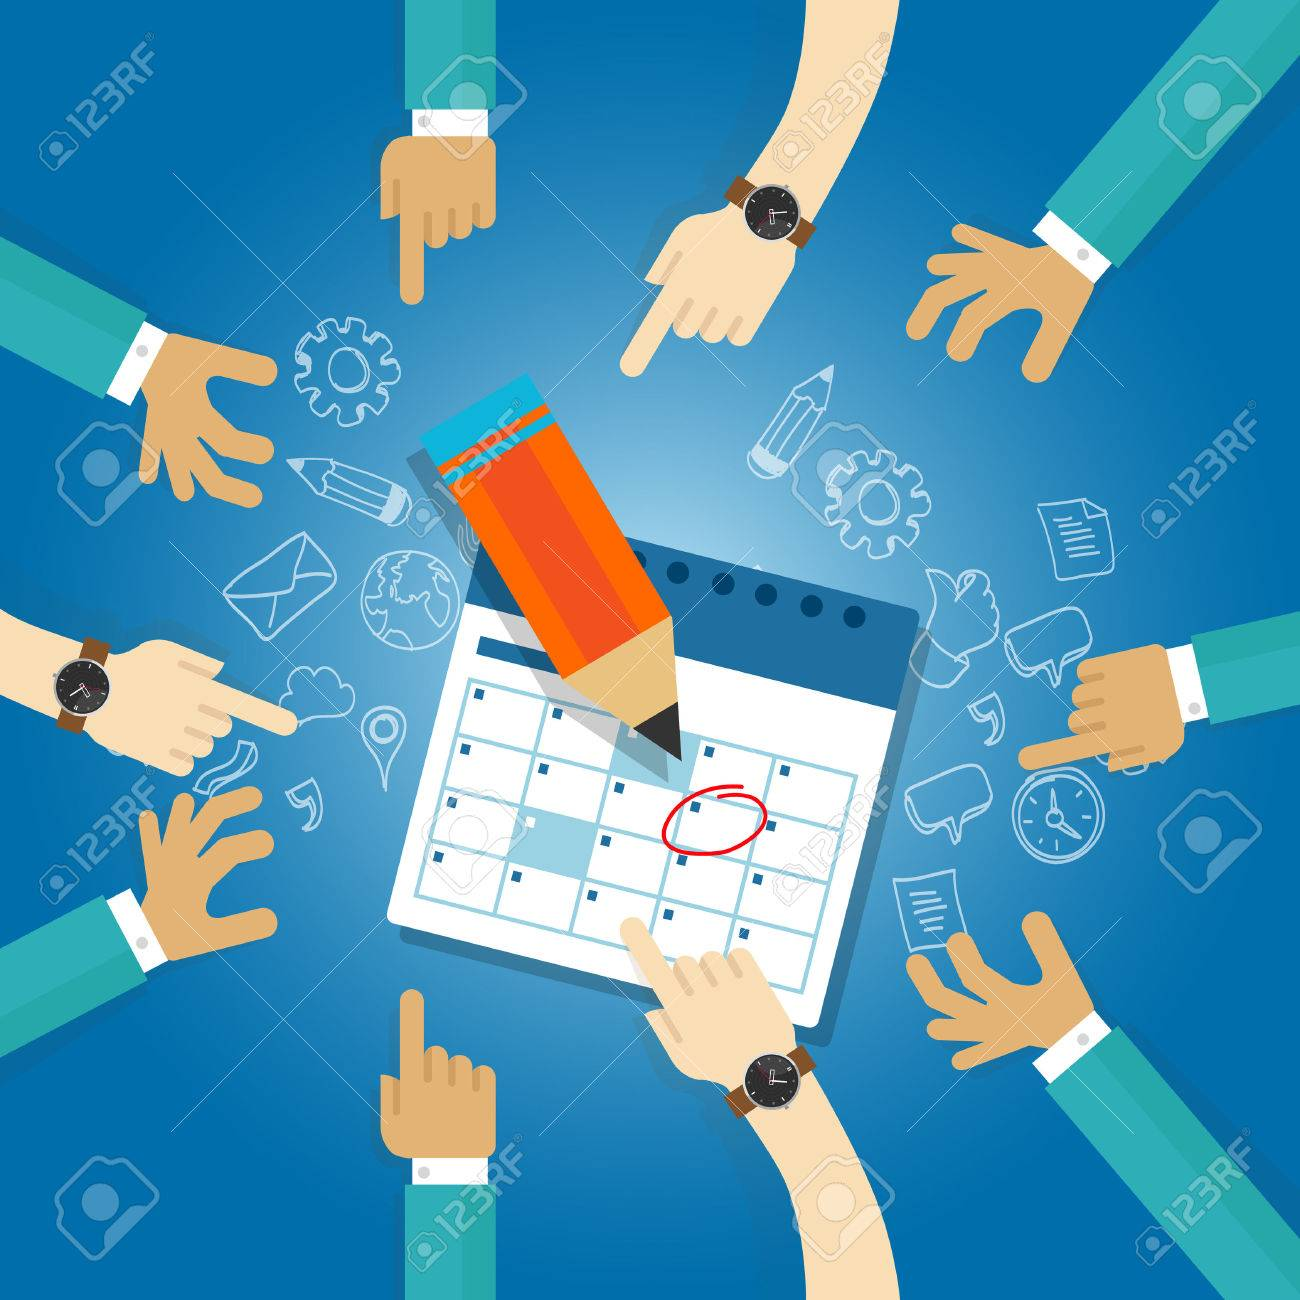 action plan calendar deadline target collaboration team meetings agenda business date next milestone achieve date together - 53582366